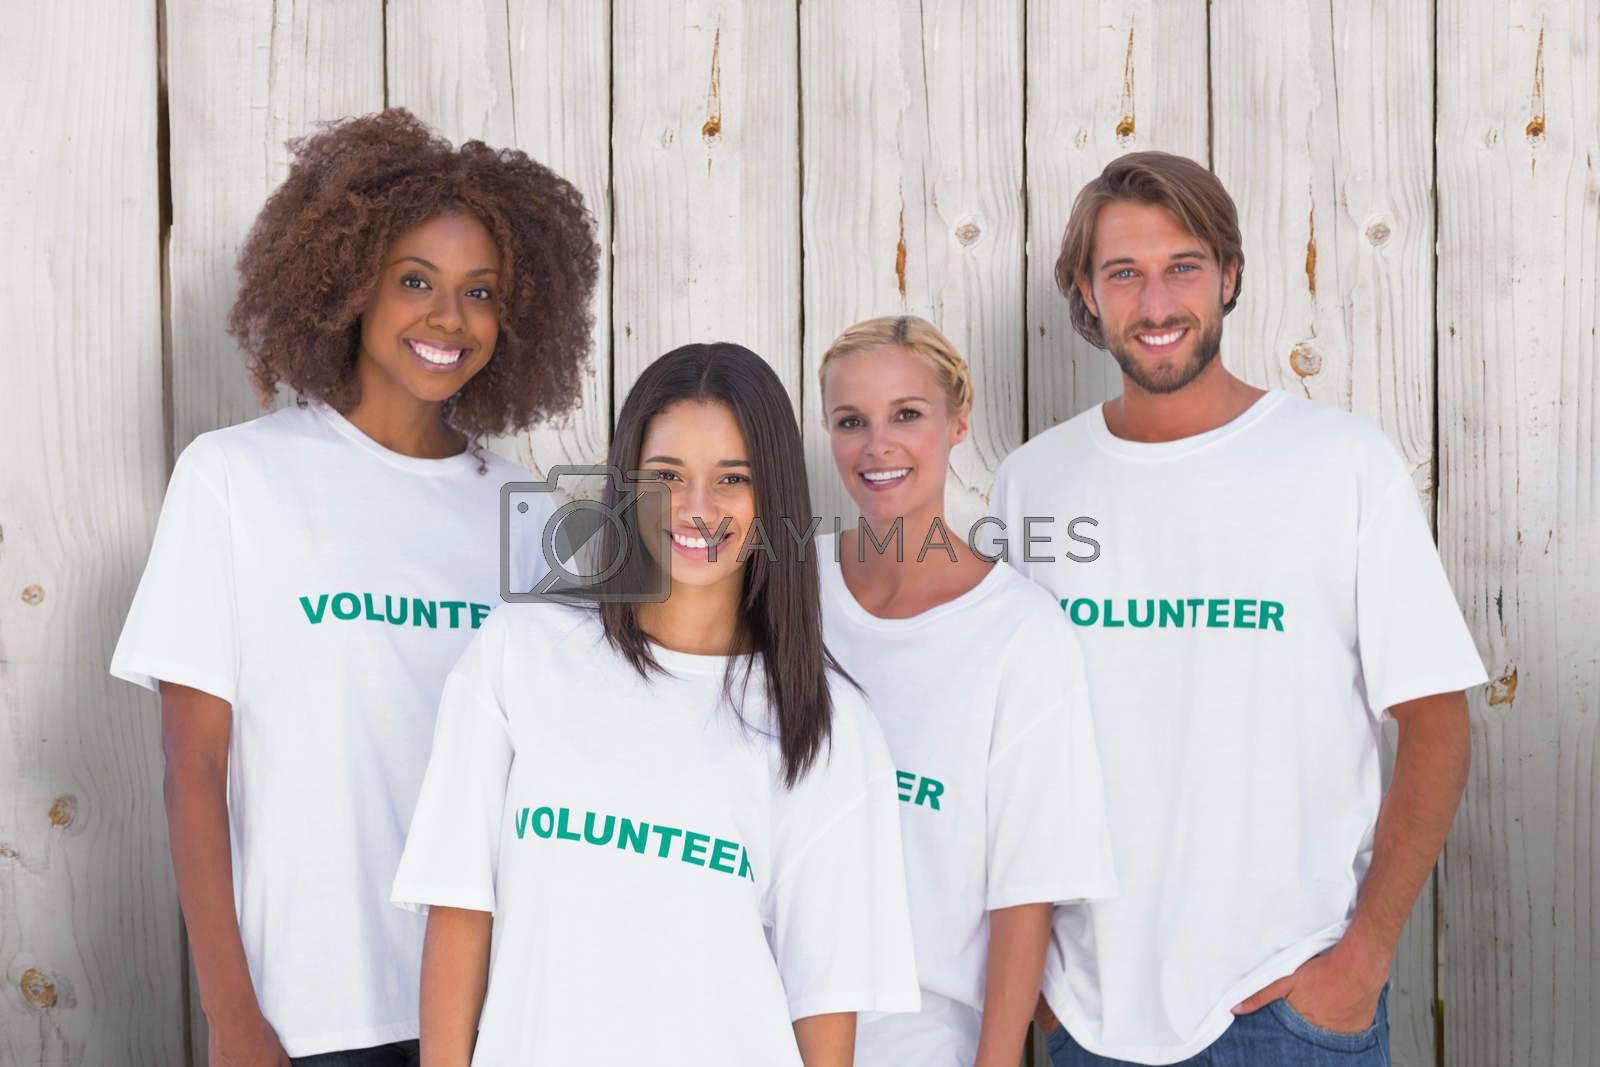 Happy group of volunteers against wooden background